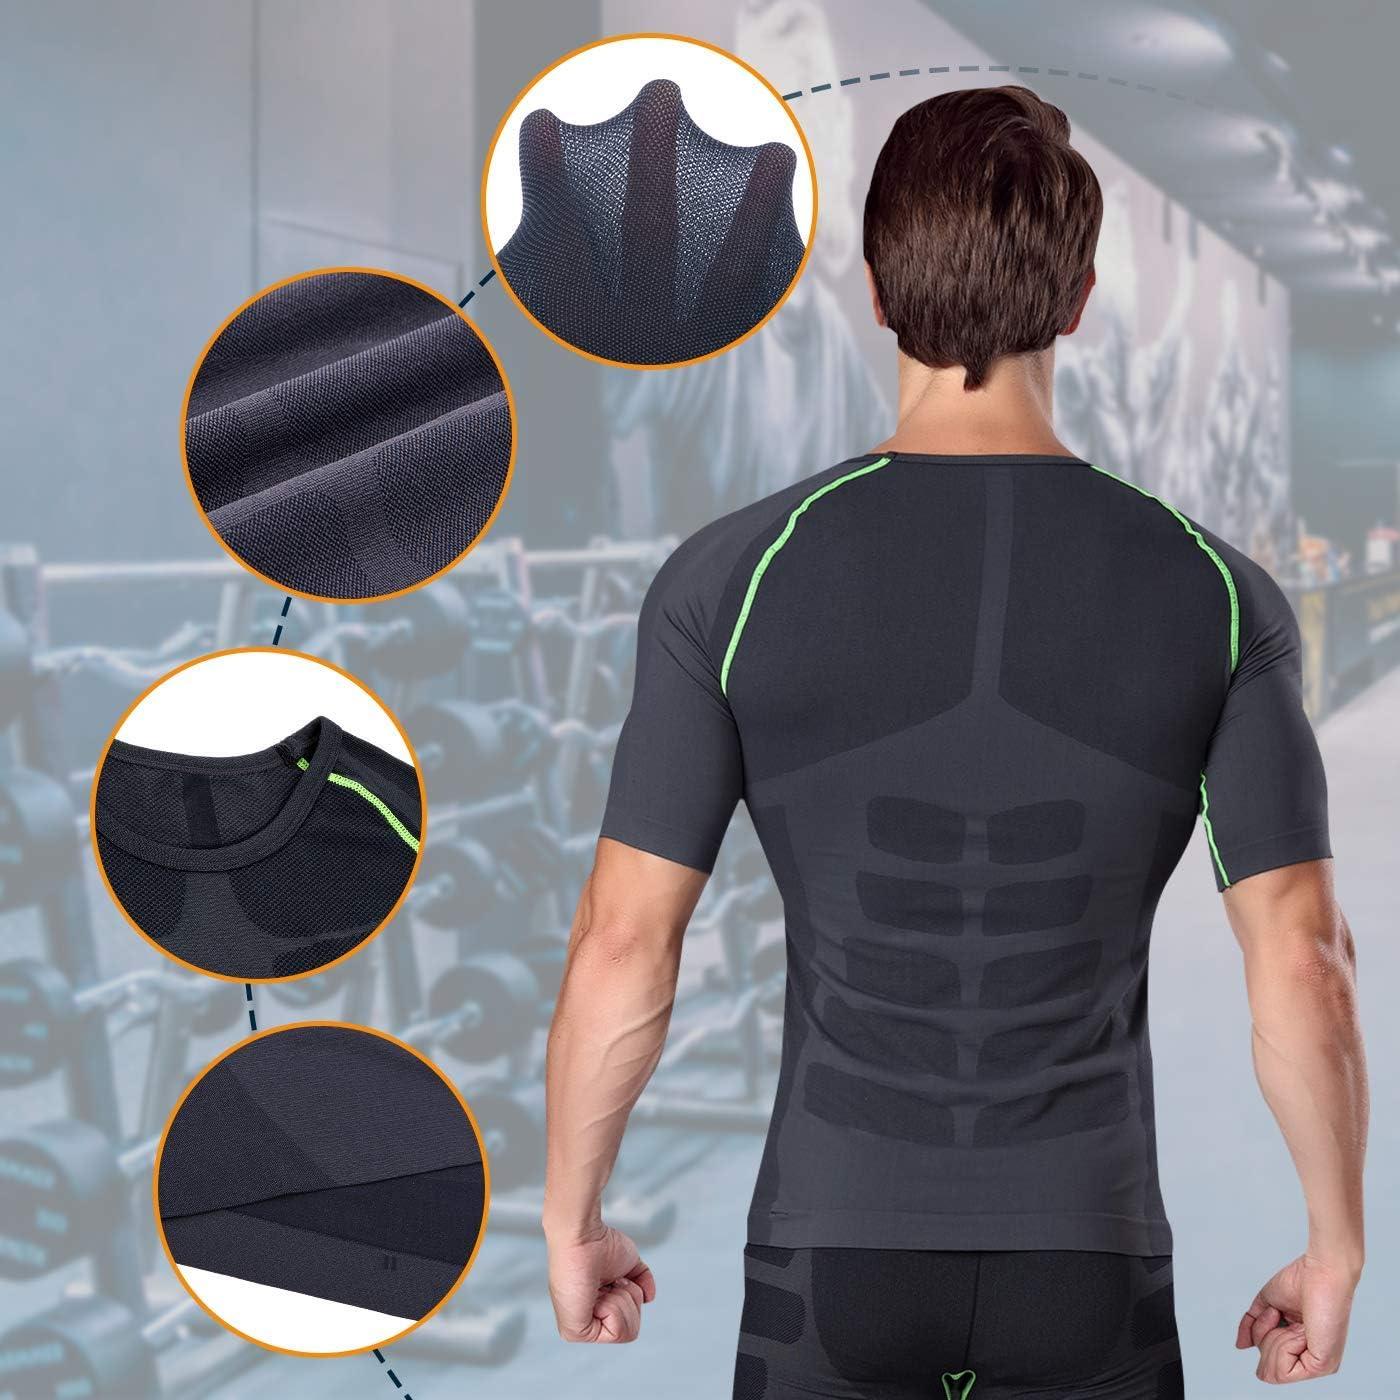 Bwiv Camiseta de Compresi/ón de Manga Corta Hombre Camisetas Deportivas para Hombres Secado R/ápido El/ástico Transpirable Running Ciclismo